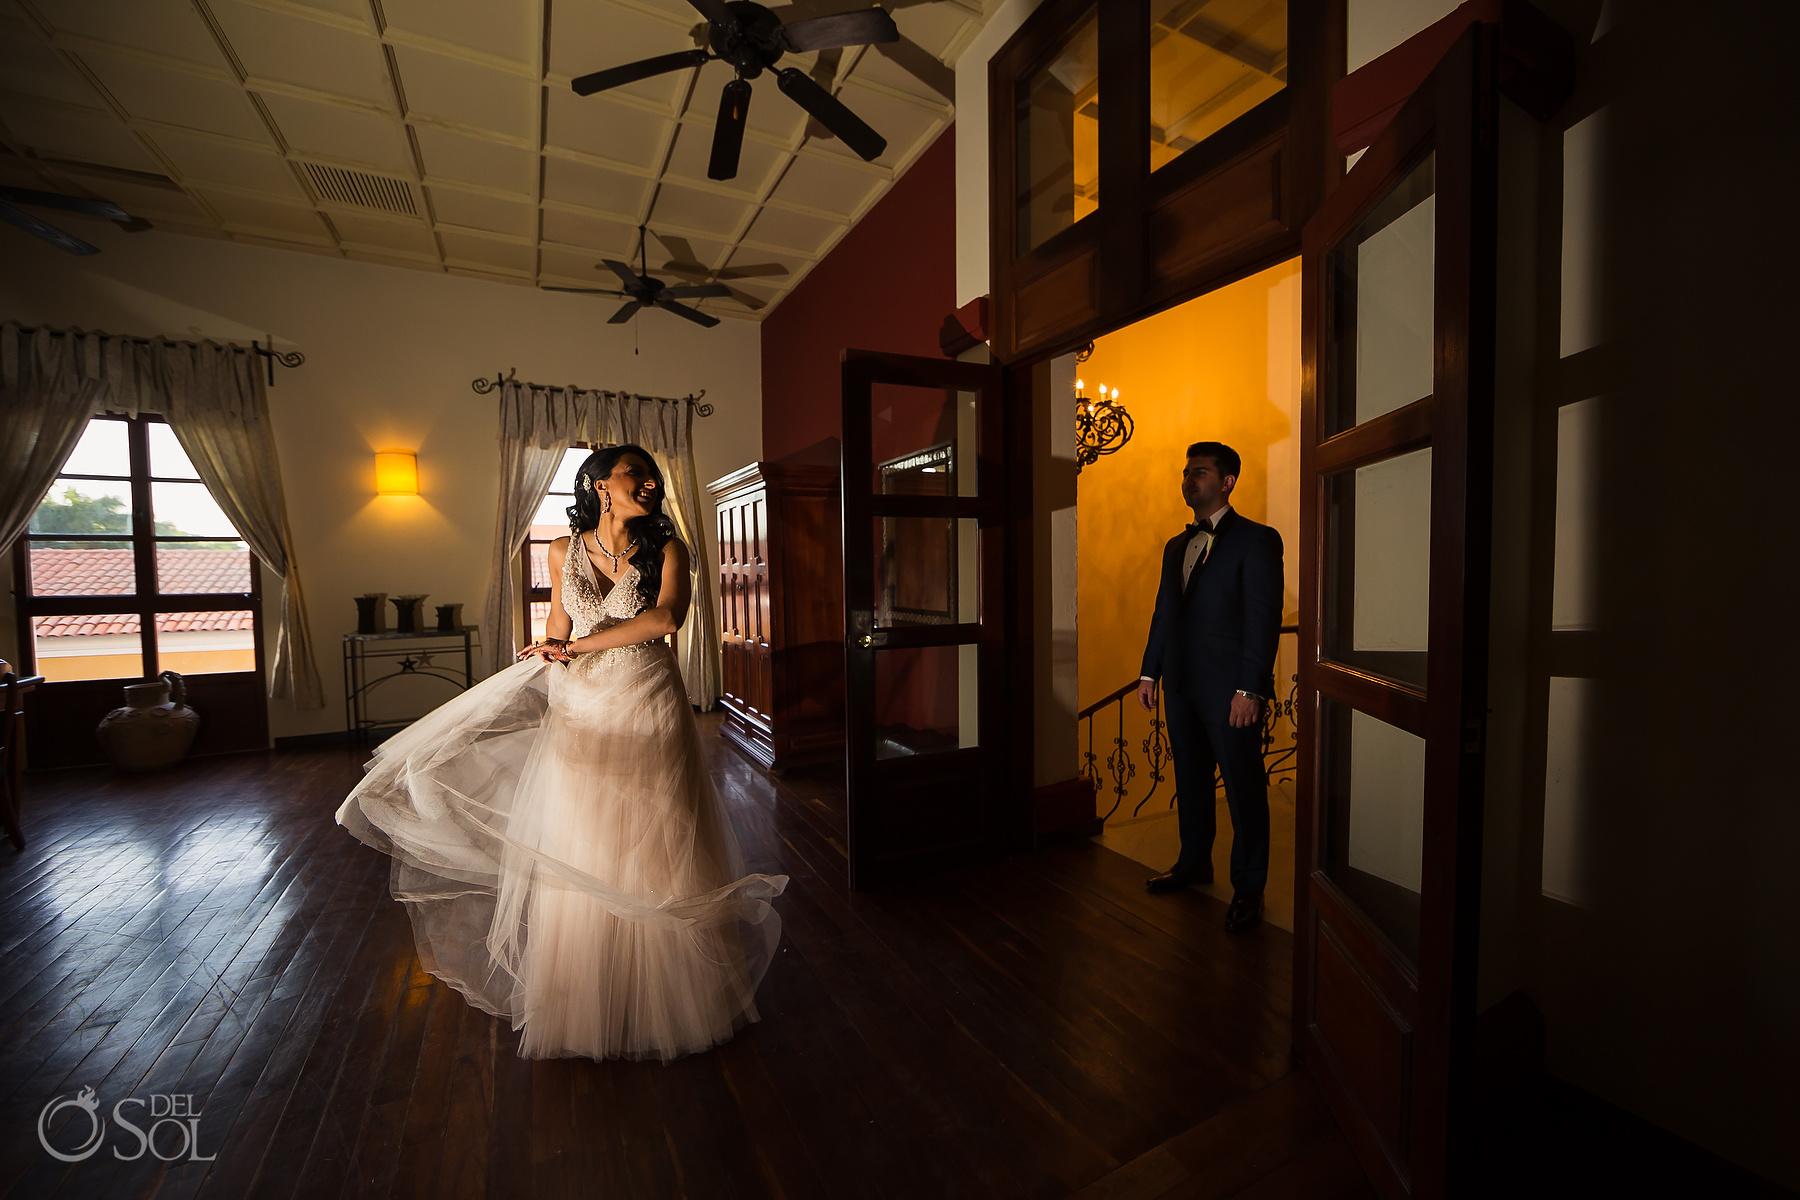 Getting Ready Bride and Groom Suite Dreams Tulum Jewish Wedding Reception